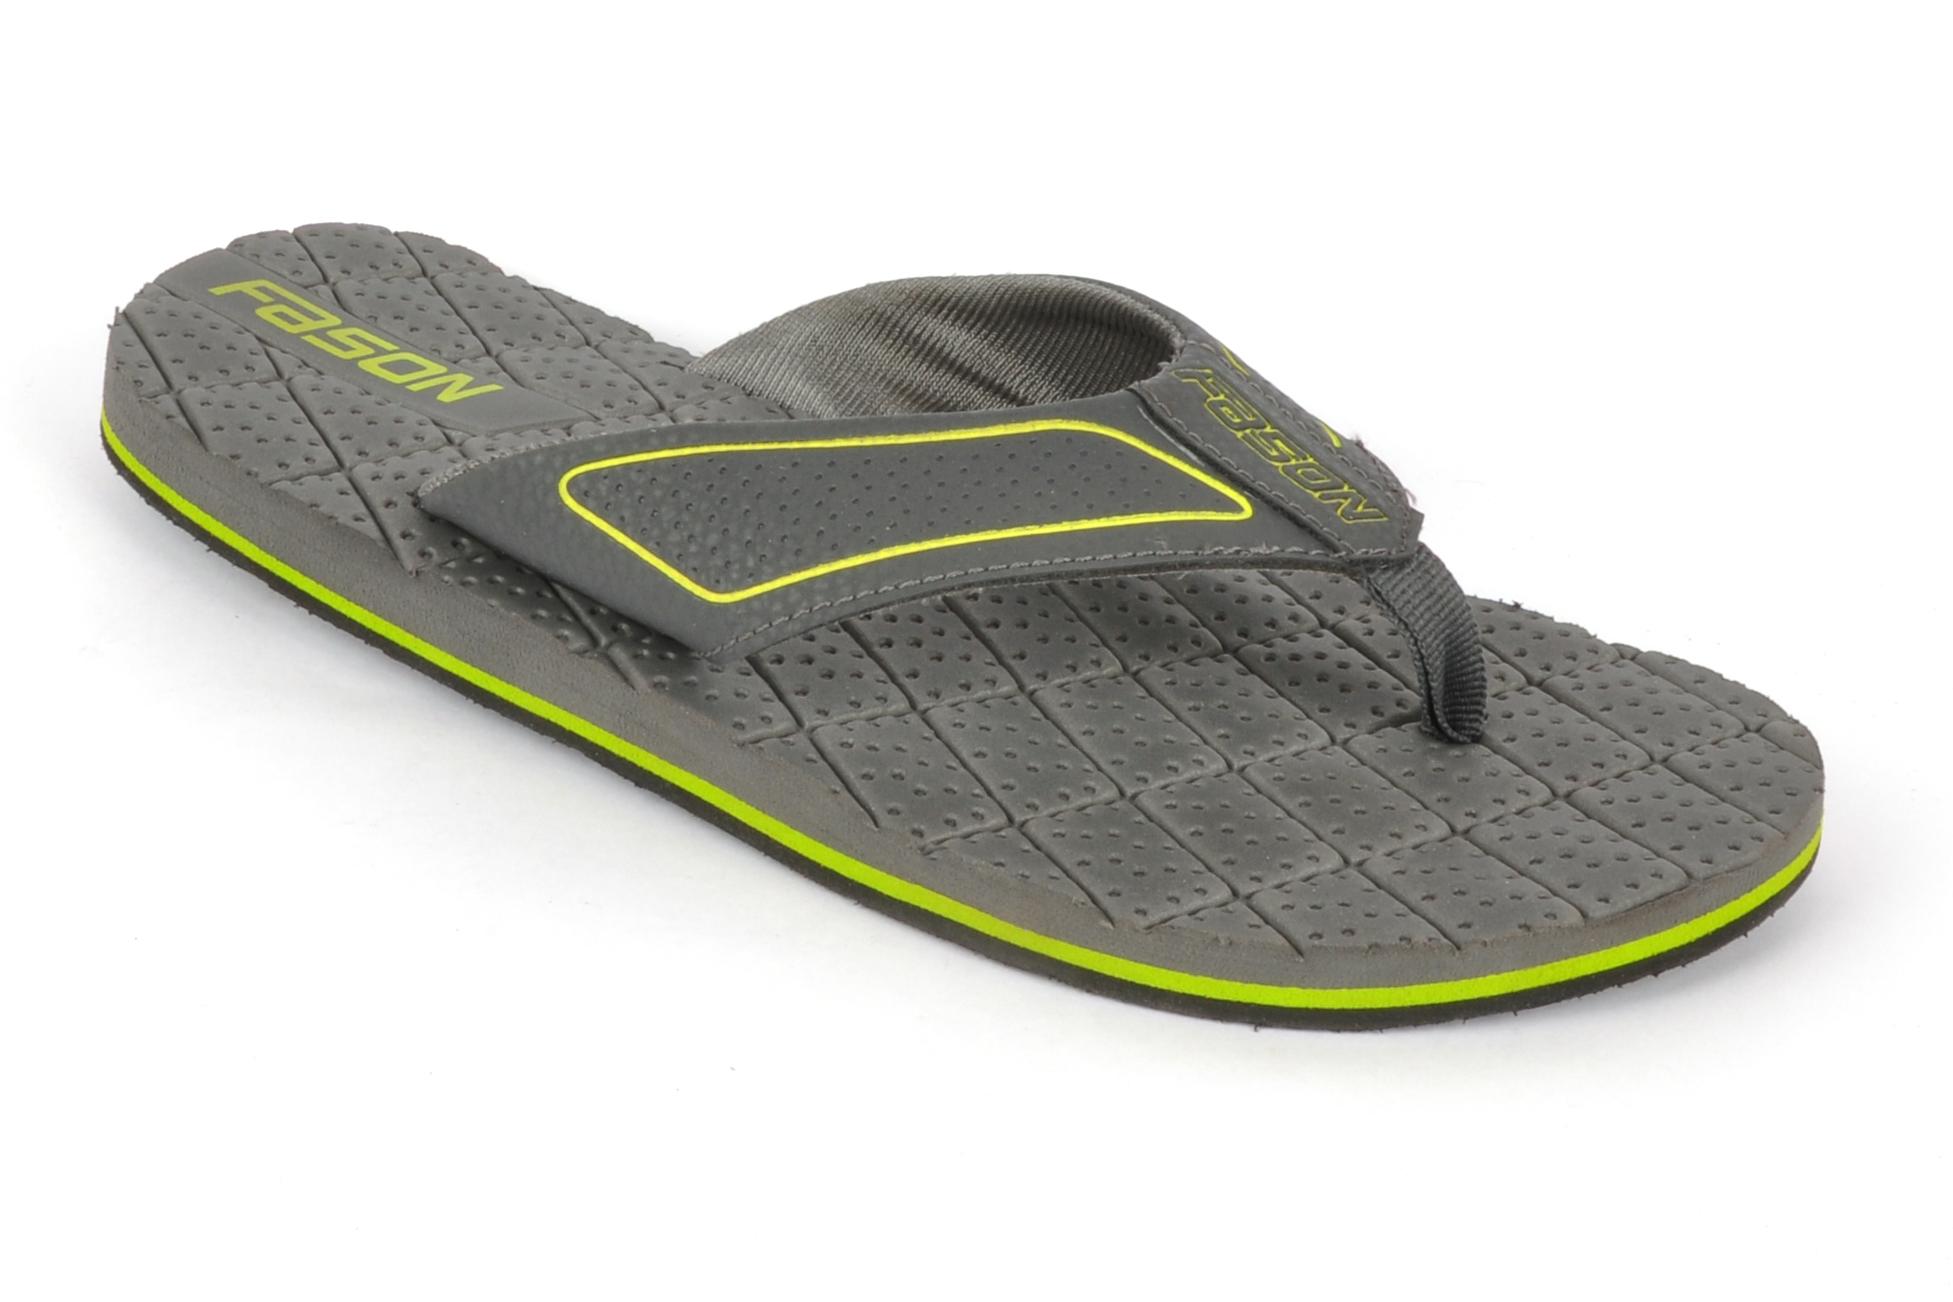 Grey & green Flip Flop slipper